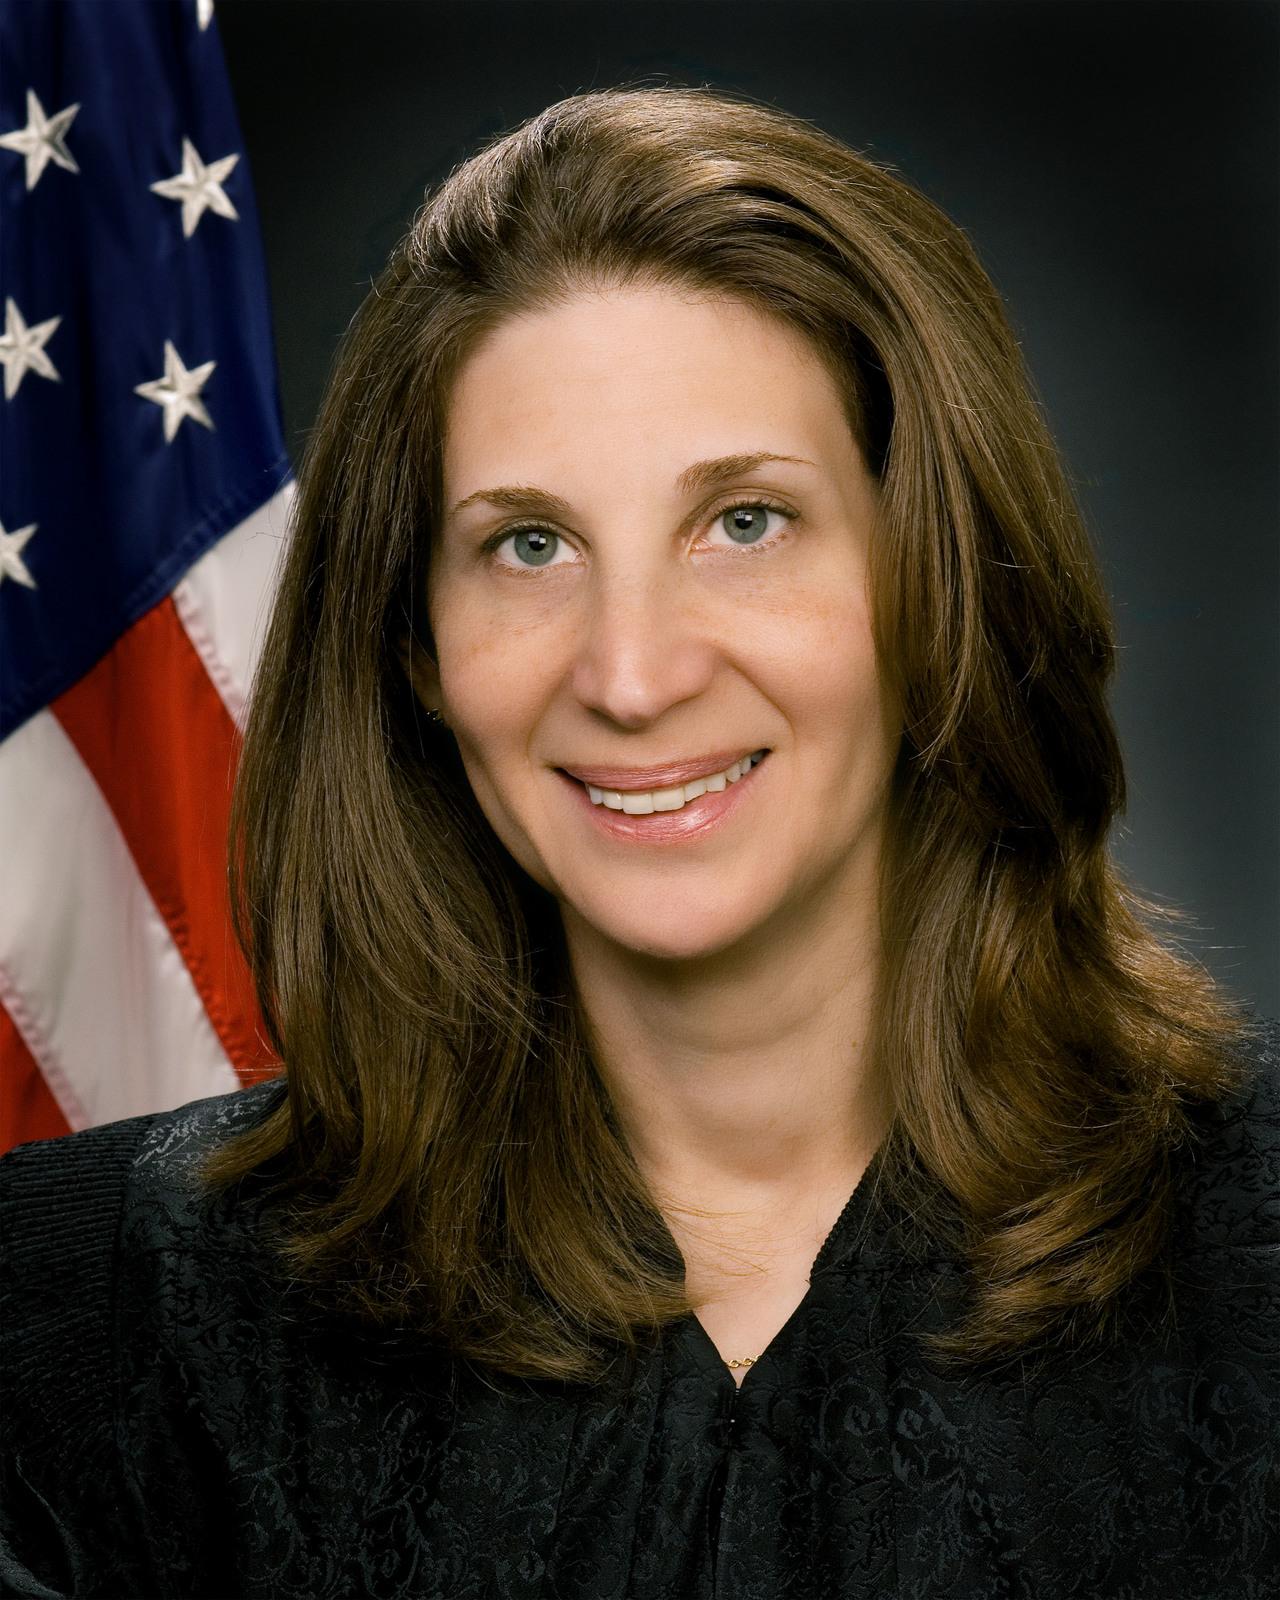 Office of Administrative Law Judges, Environmental Appeals Board - Portraits of Judge Susan Biro [412-APD-30-SusanBiro_8x10.jpg]